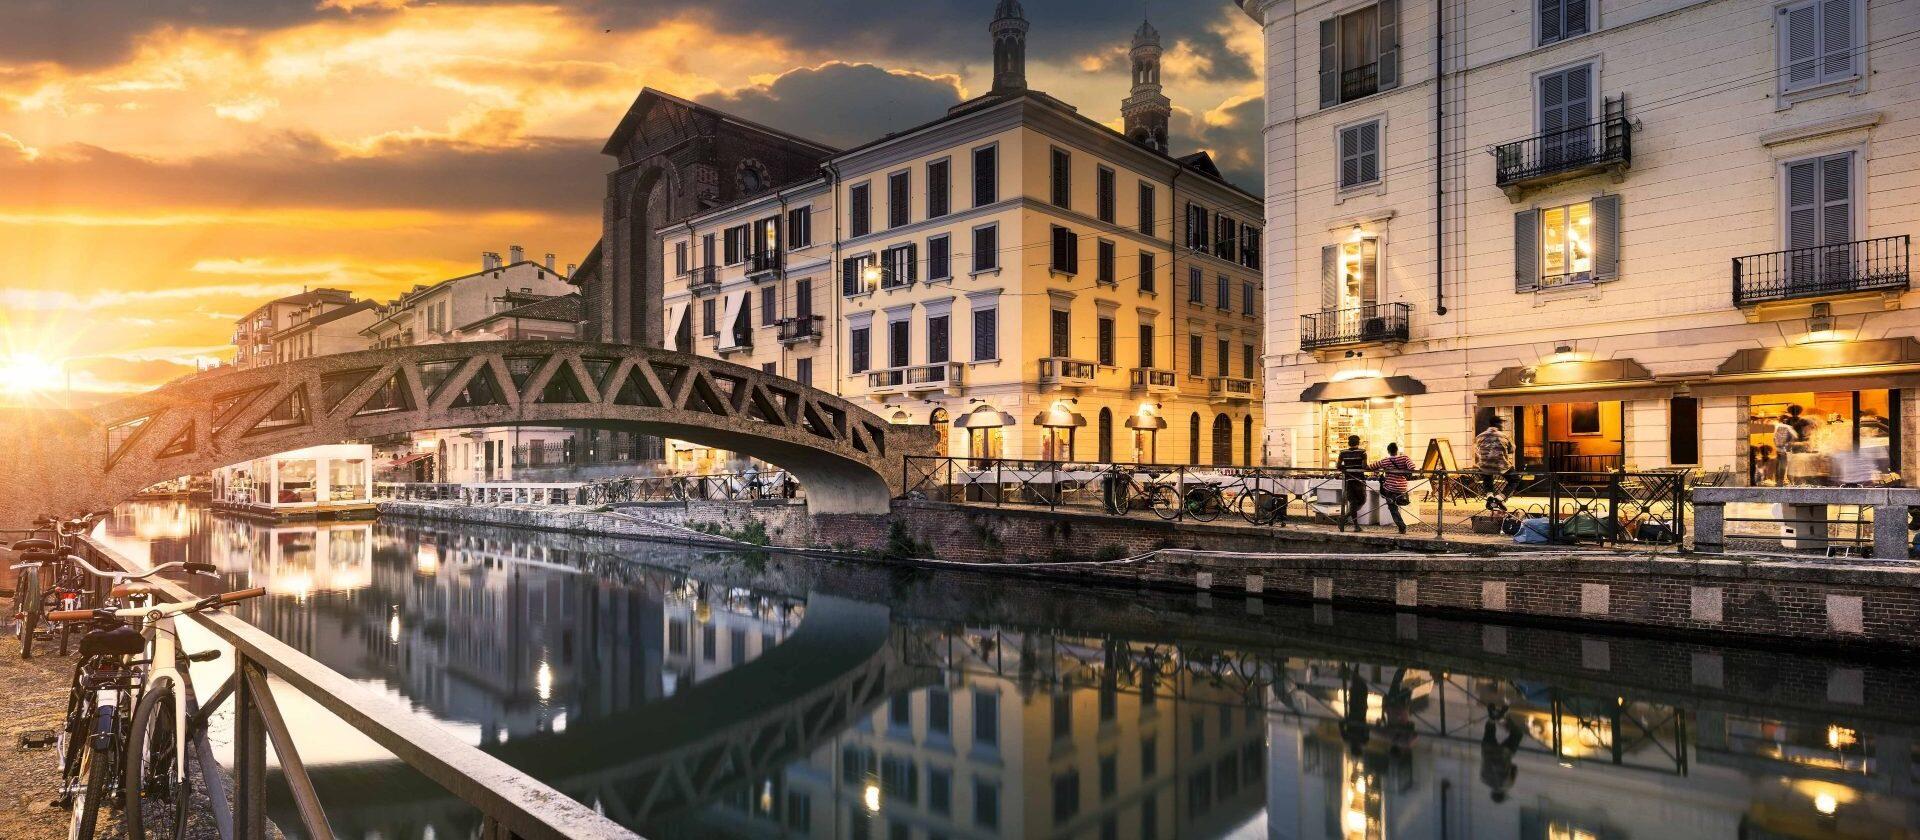 Milan - Fashion Capital of Italy